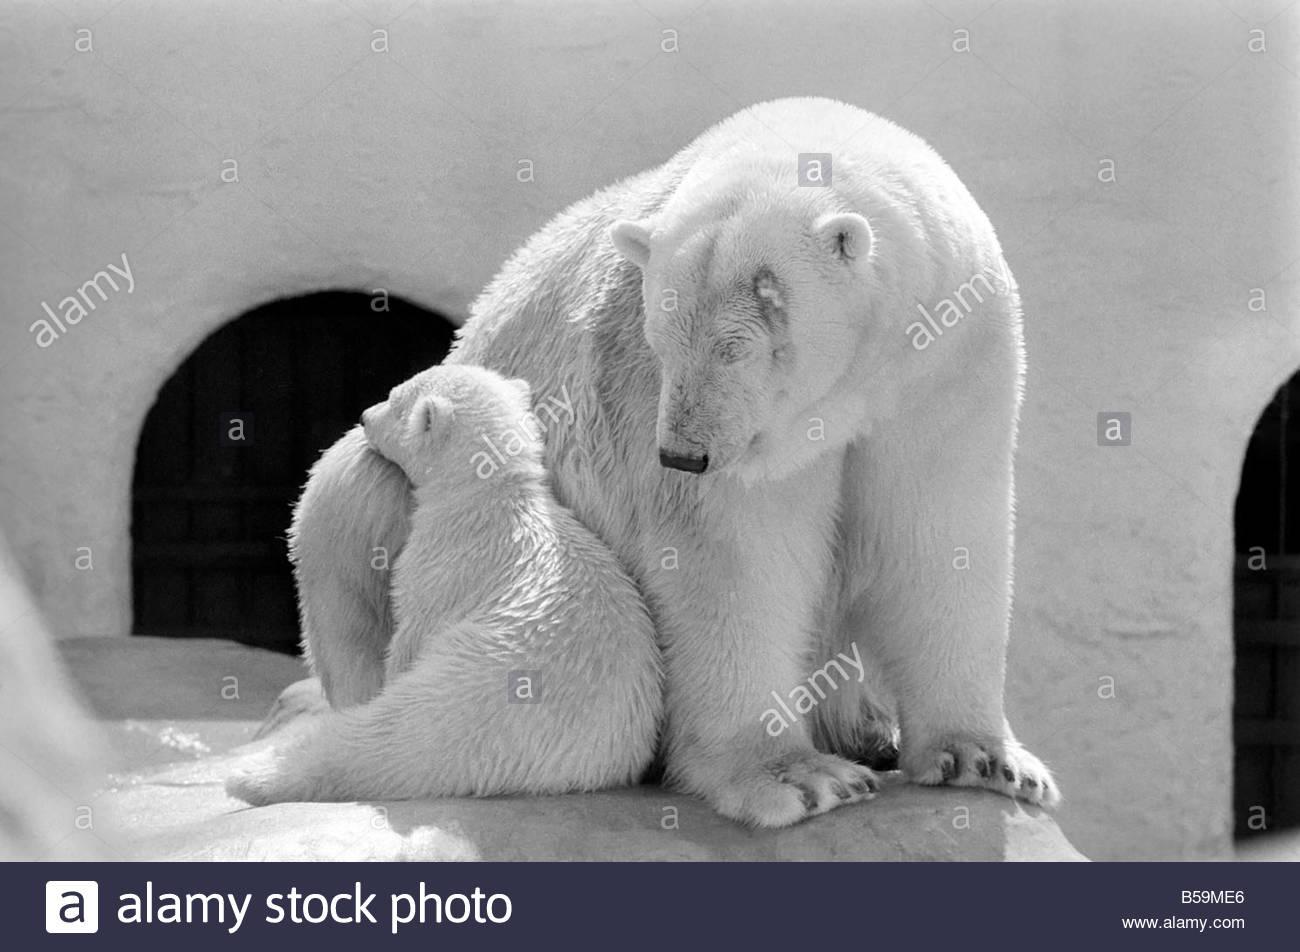 polar bears at bristol zoo april 1975 75 2224 005 B59ME6